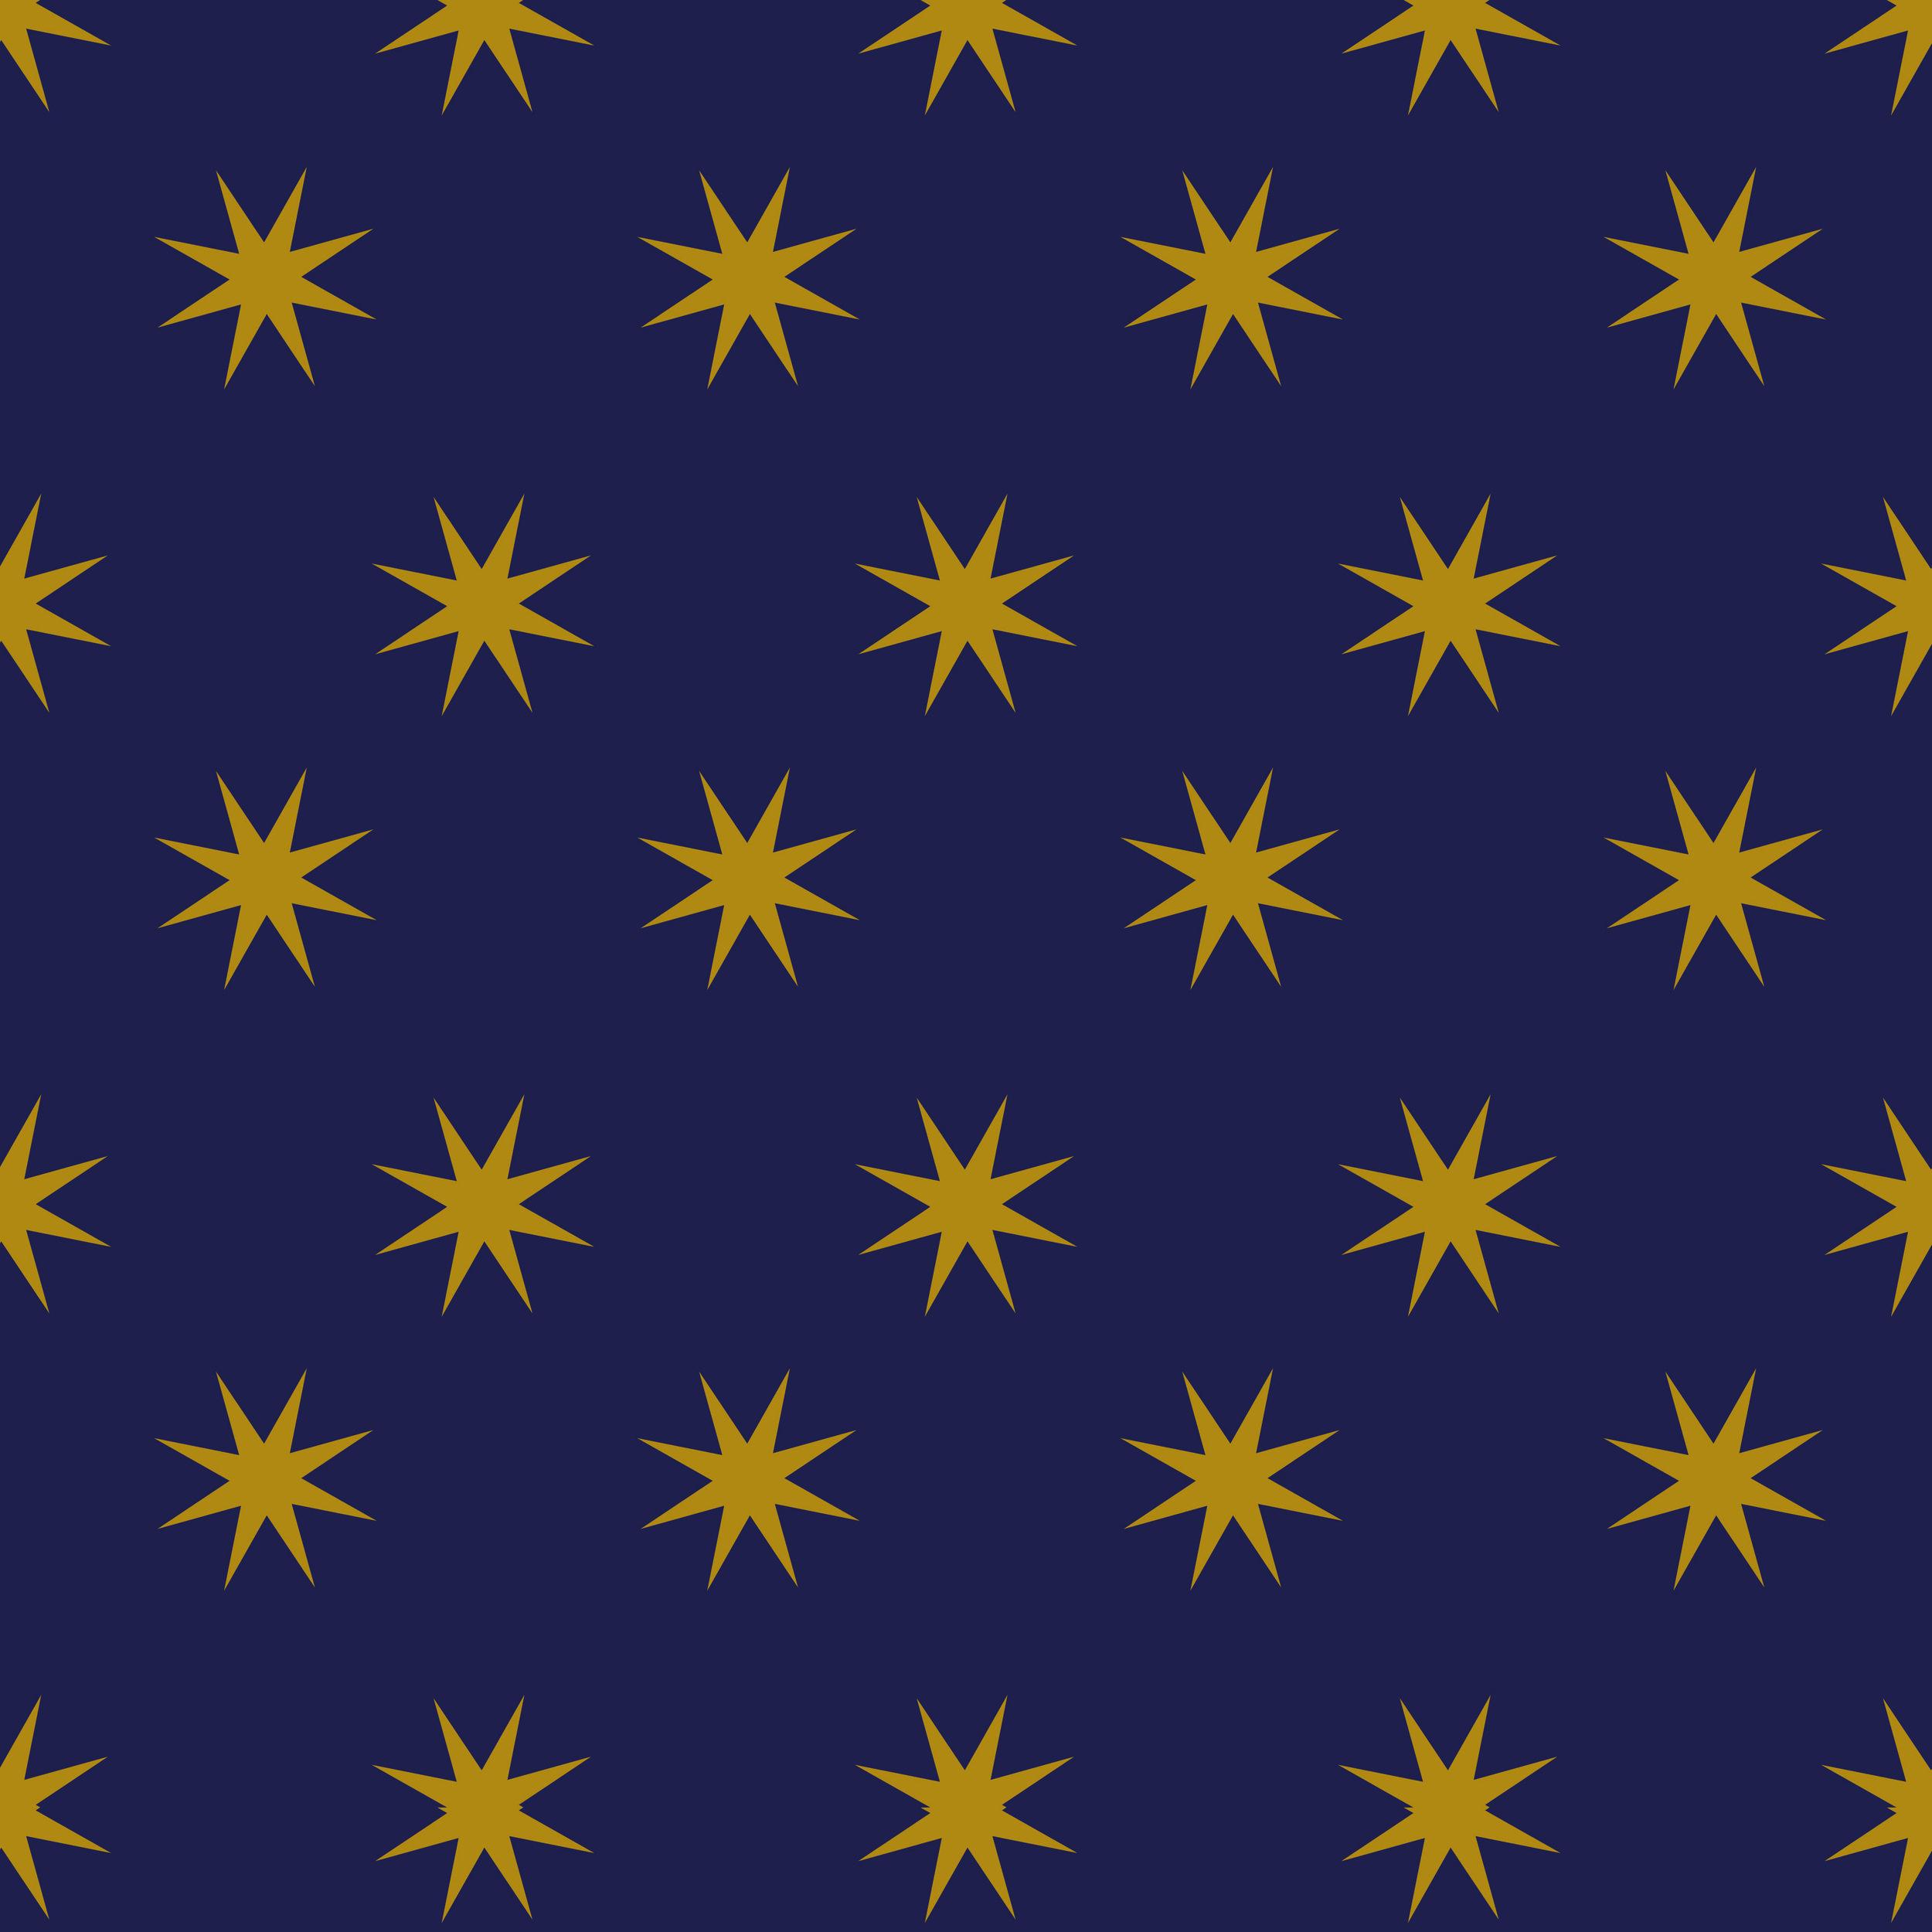 C4743-NAVY_LaVieBoheme_Stars_300dpi.jpg